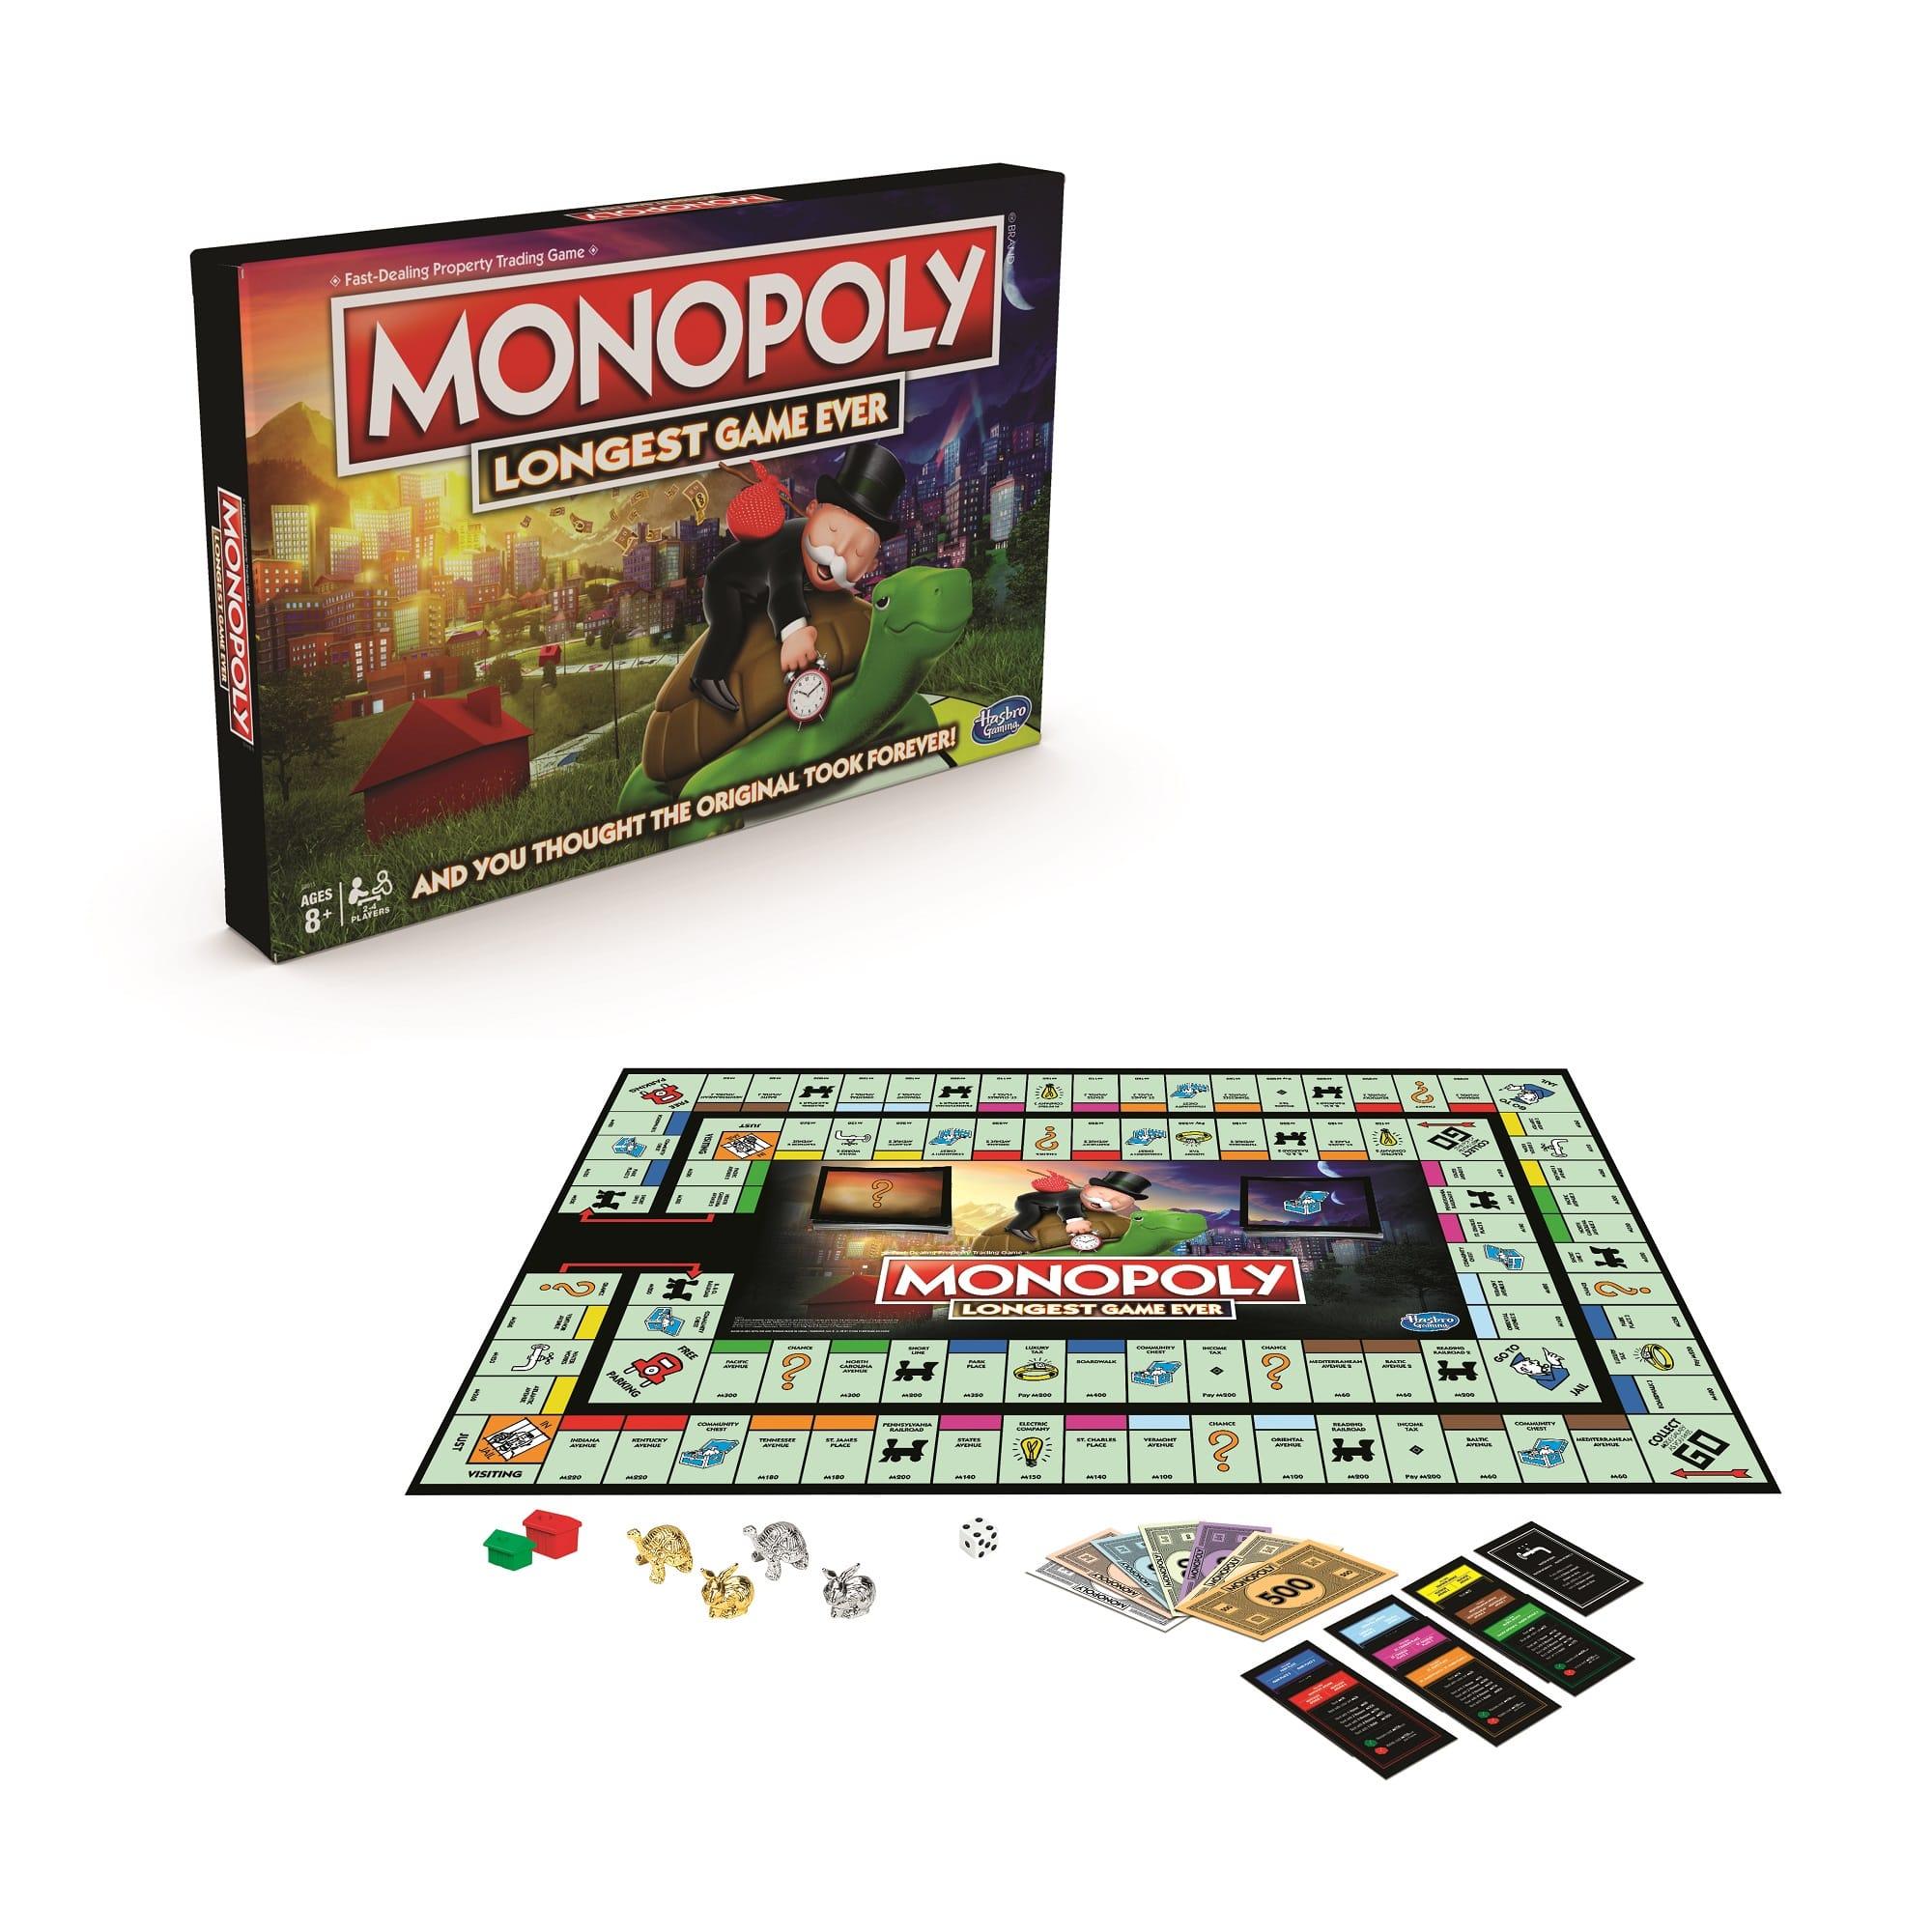 E8915 MONOPOLY Longest Game Ever detail main